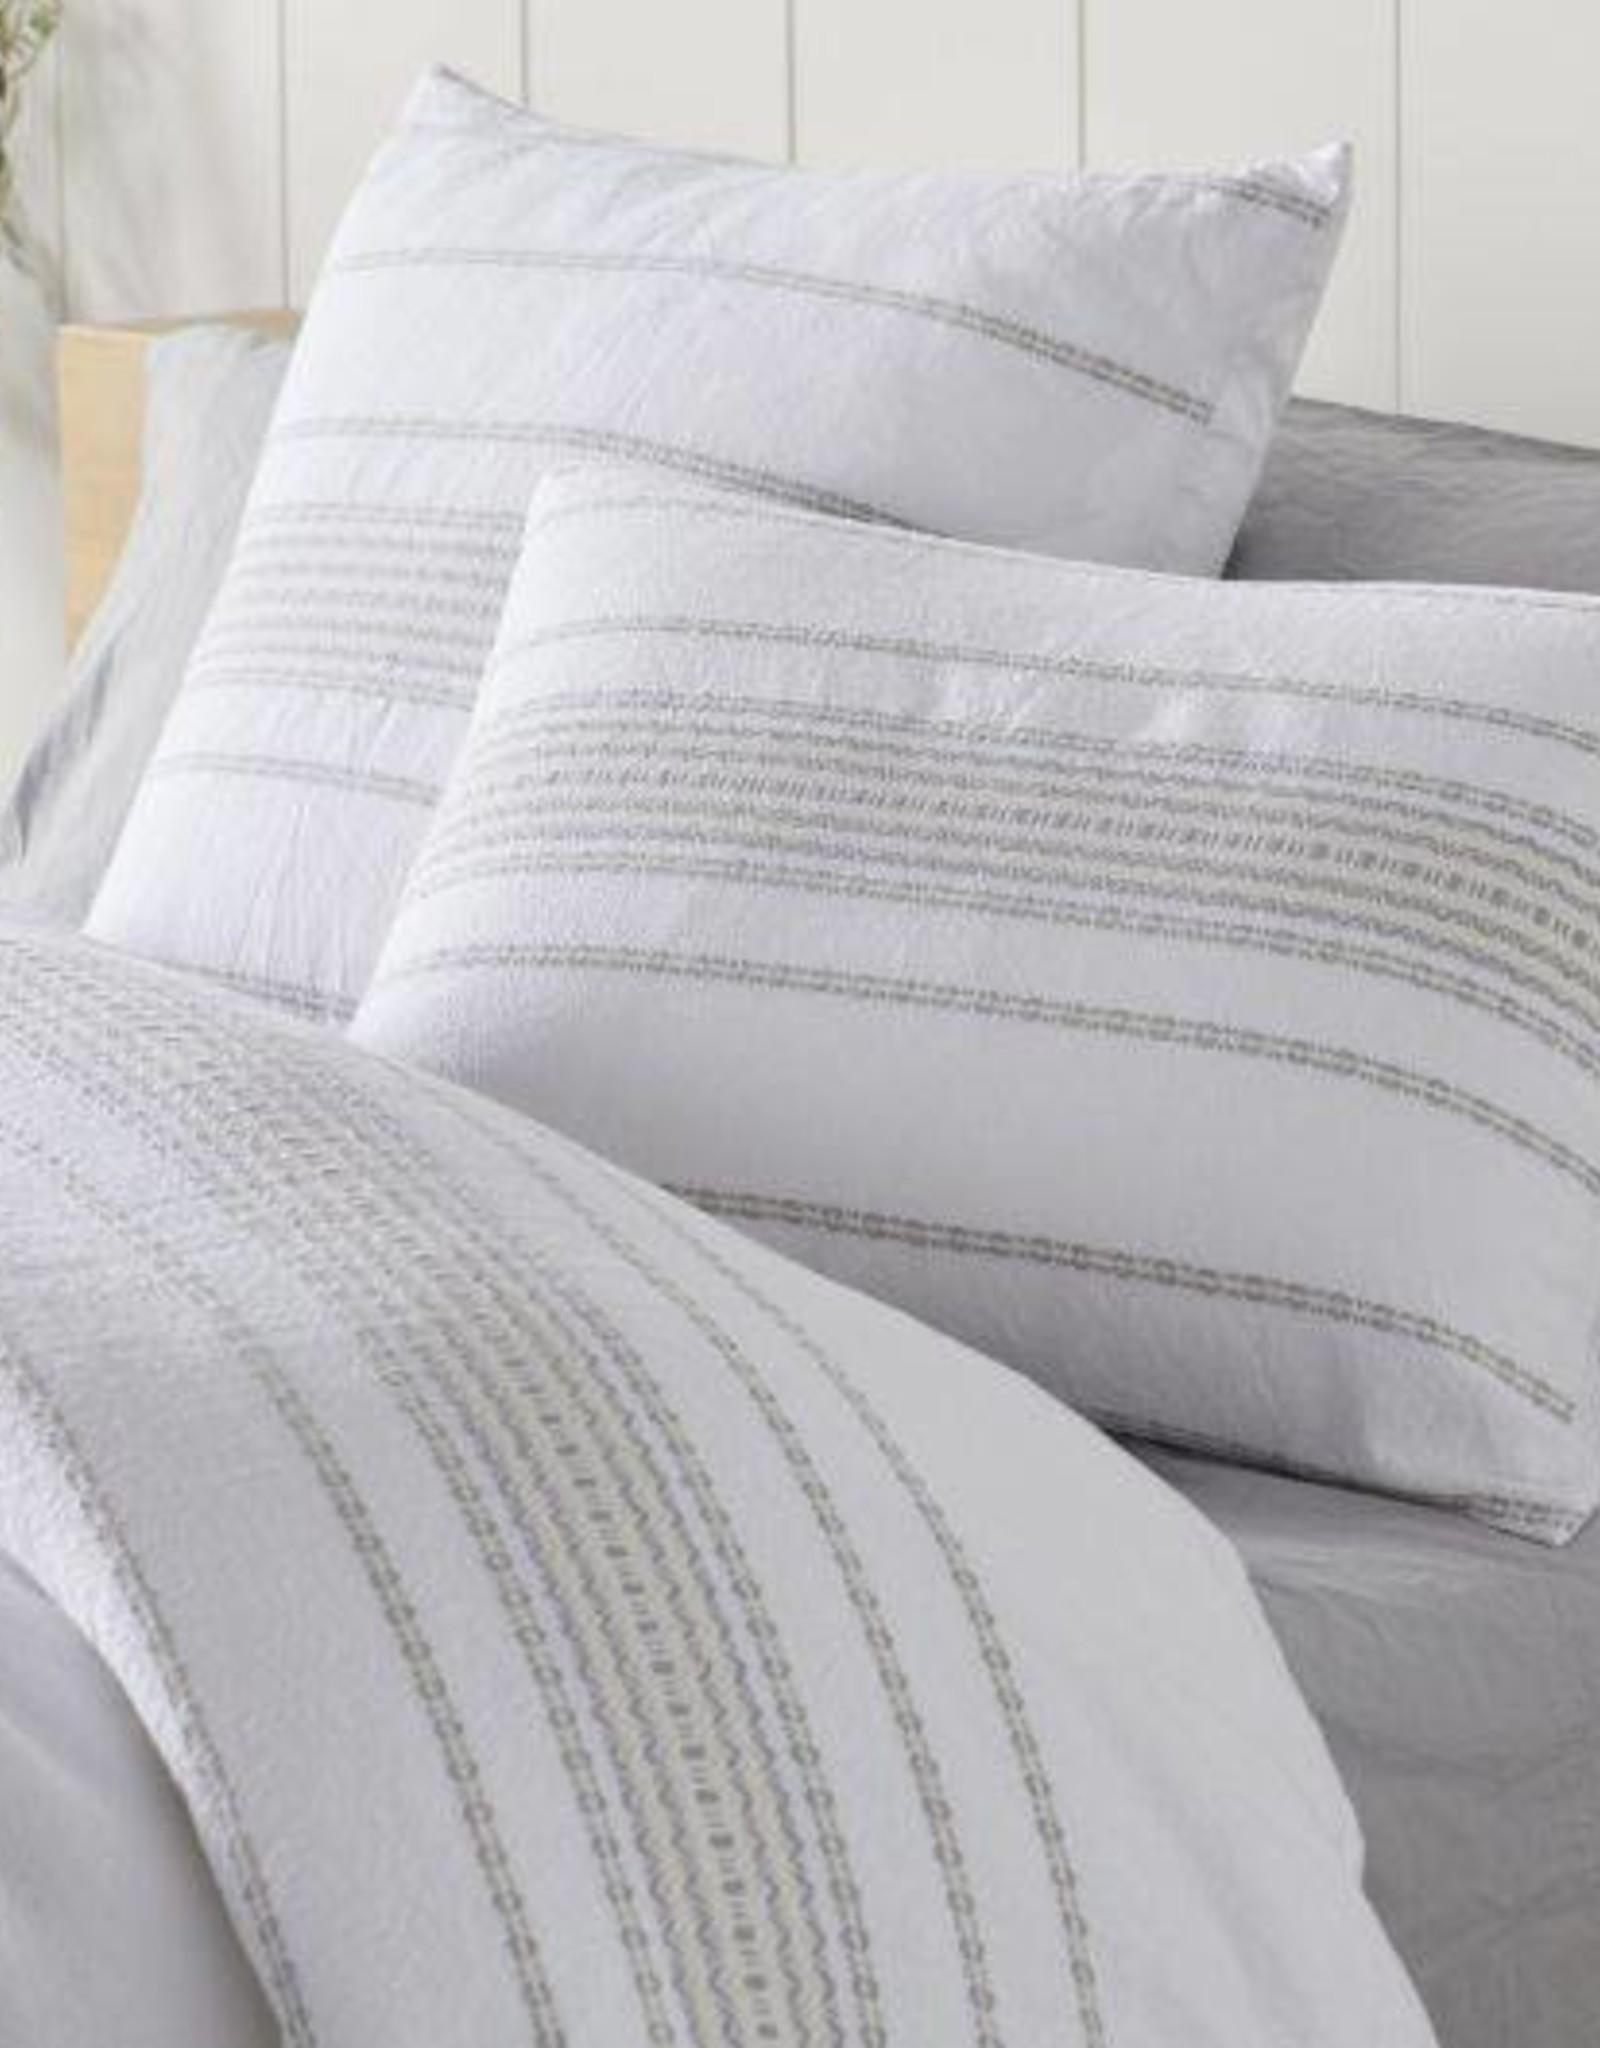 Rippled Stripe Duvet Cover- Alpine White with Gray